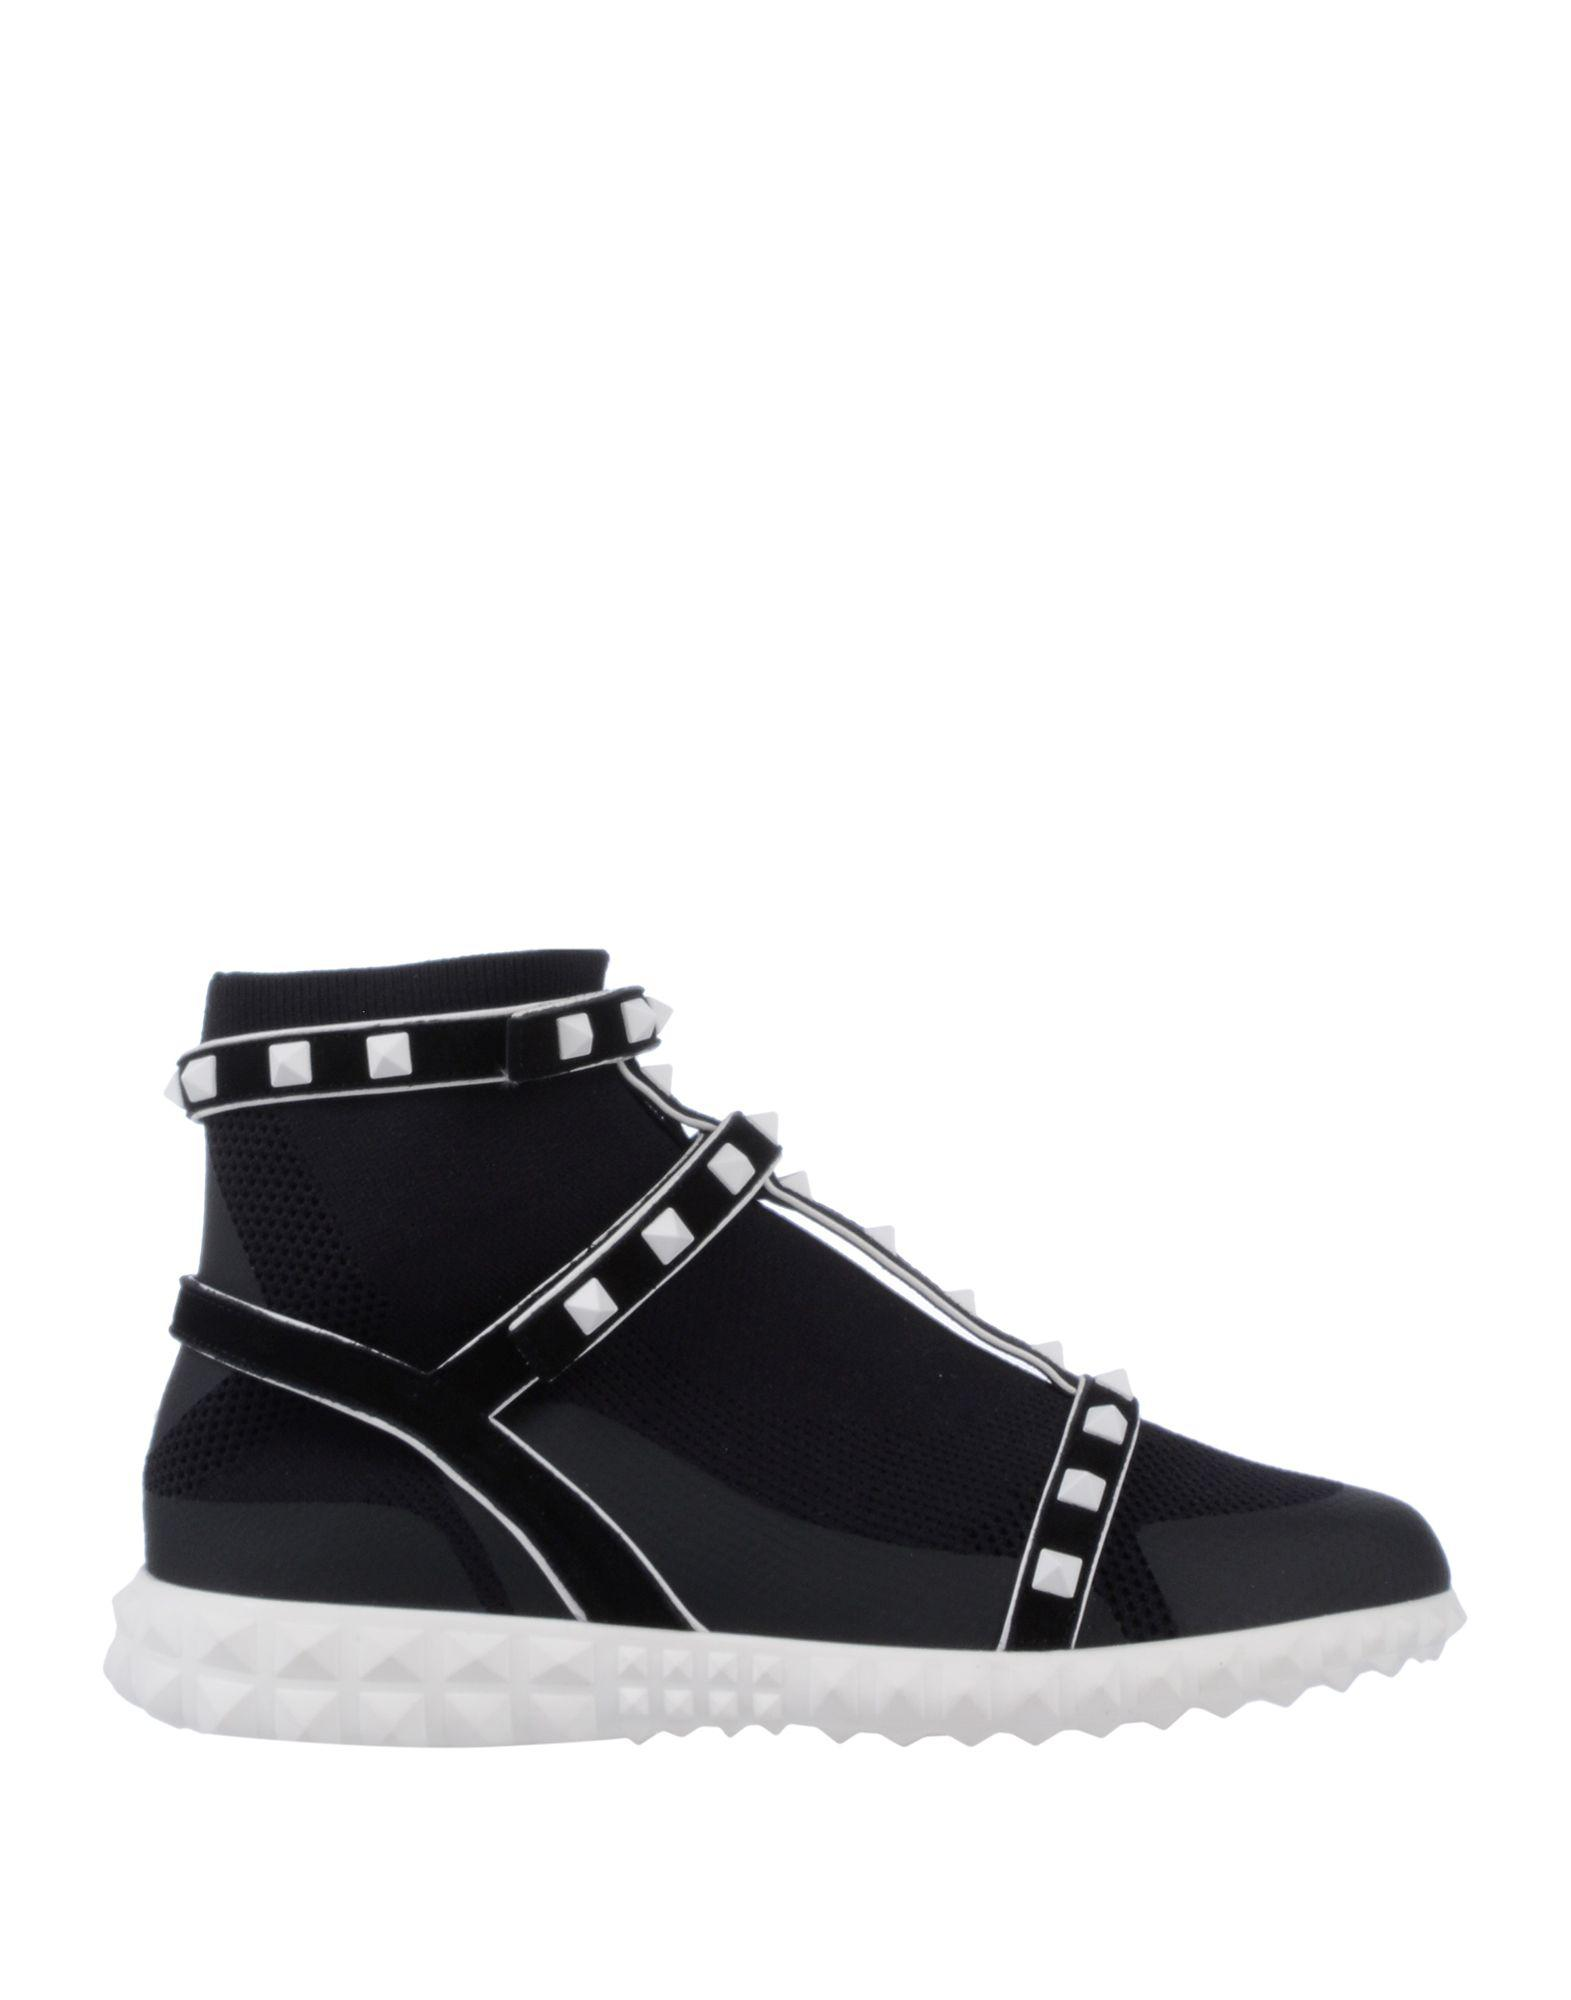 28cab5de6344 Valentino - Black High-tops   Sneakers - Lyst. View fullscreen